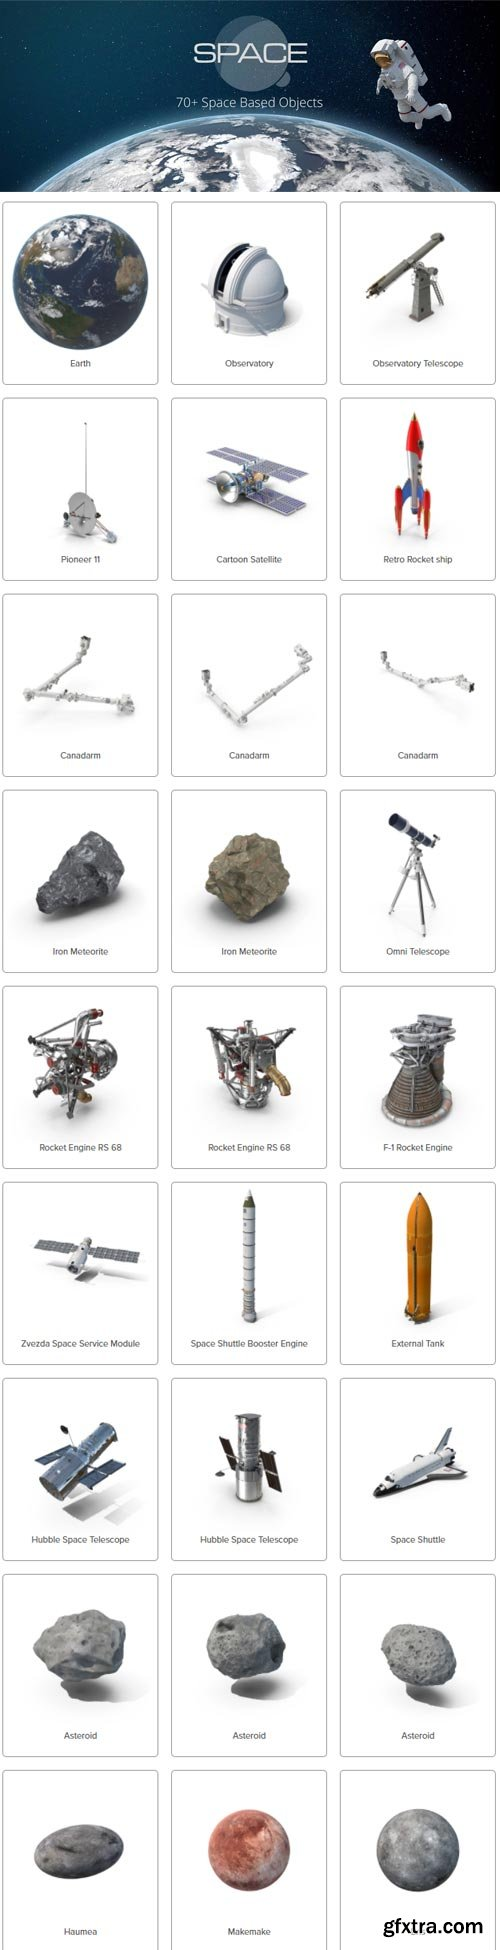 PixelSquid - Space Collection